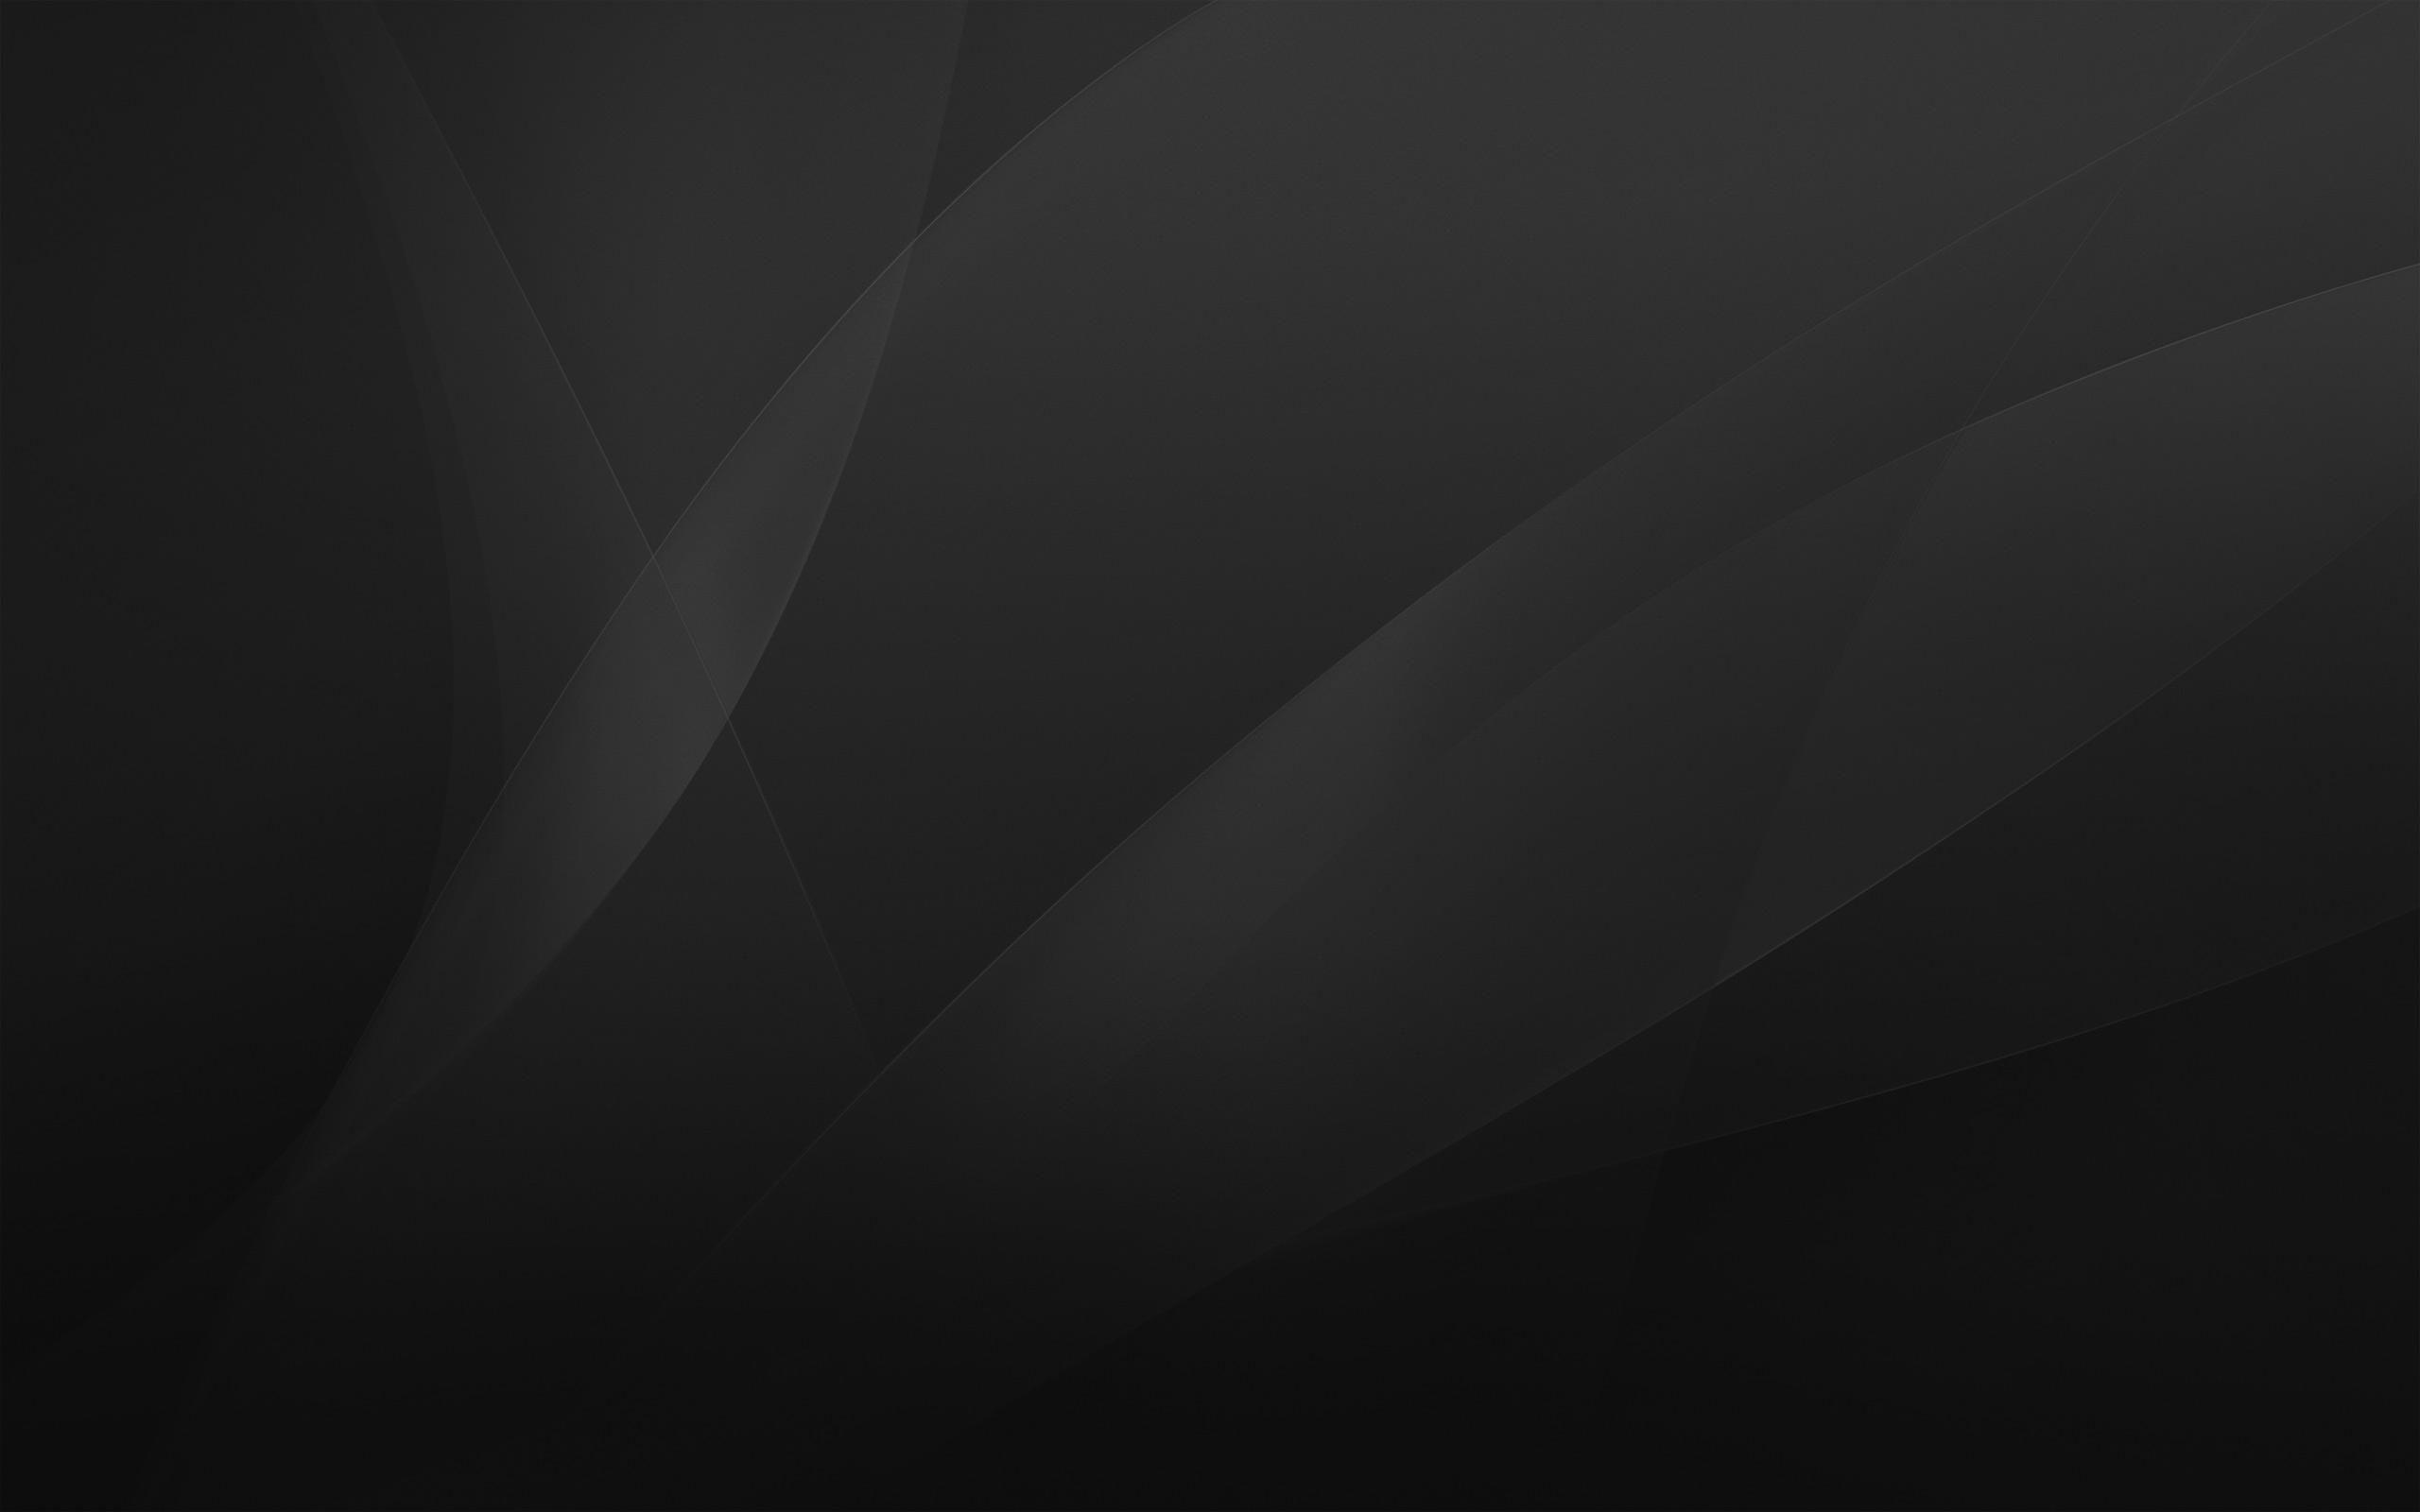 HD Black Wallpapers